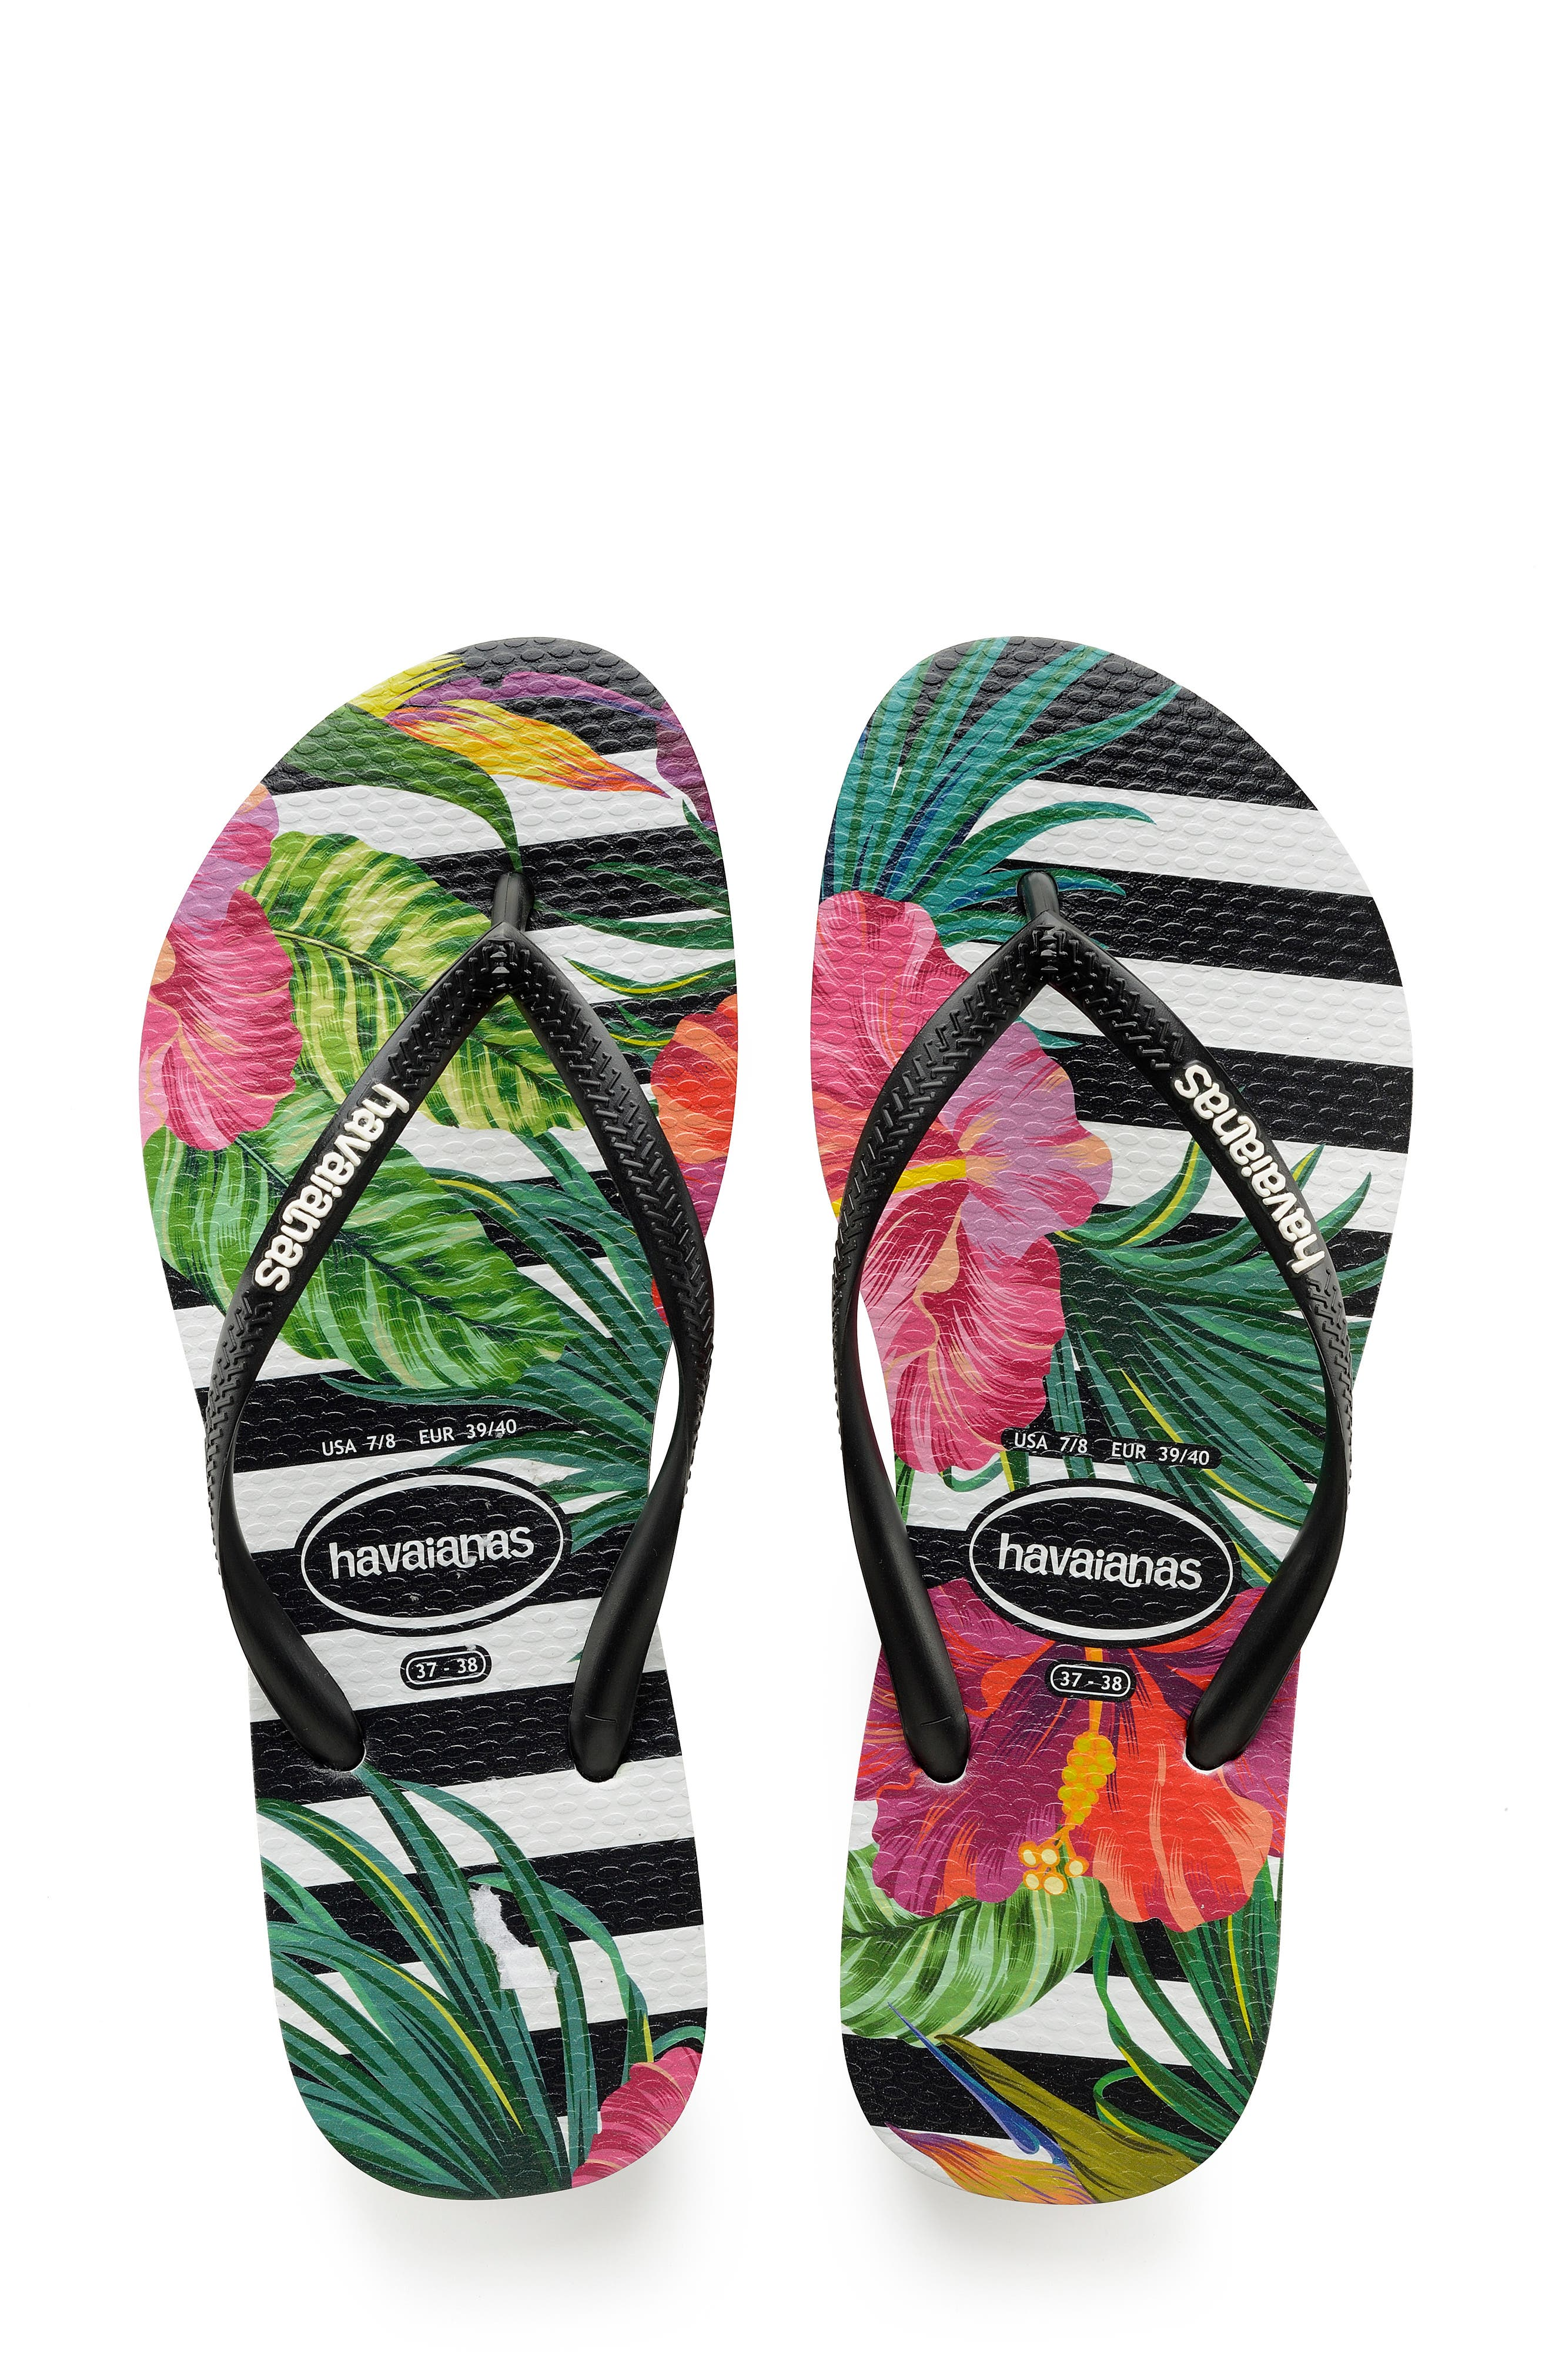 428d645fd0b5c Black Havaianas Flip-Flops for Women